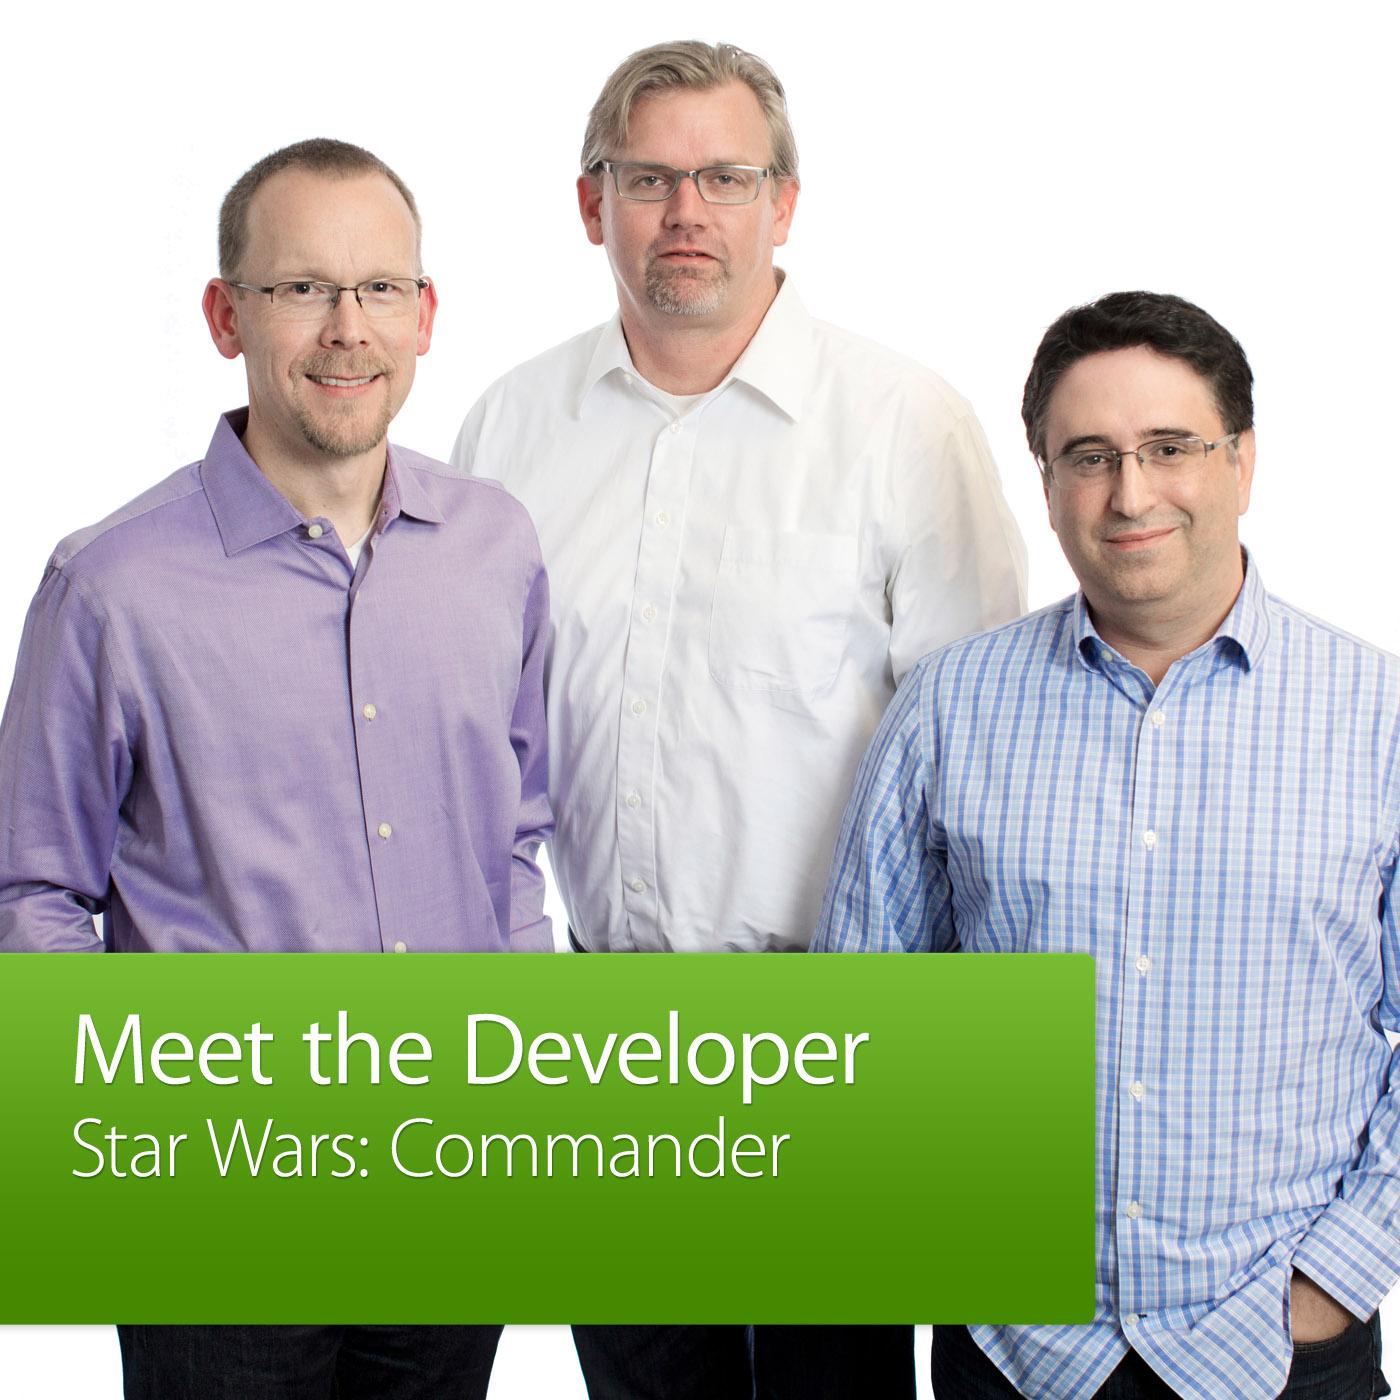 Star Wars: Commander: Meet the Developer